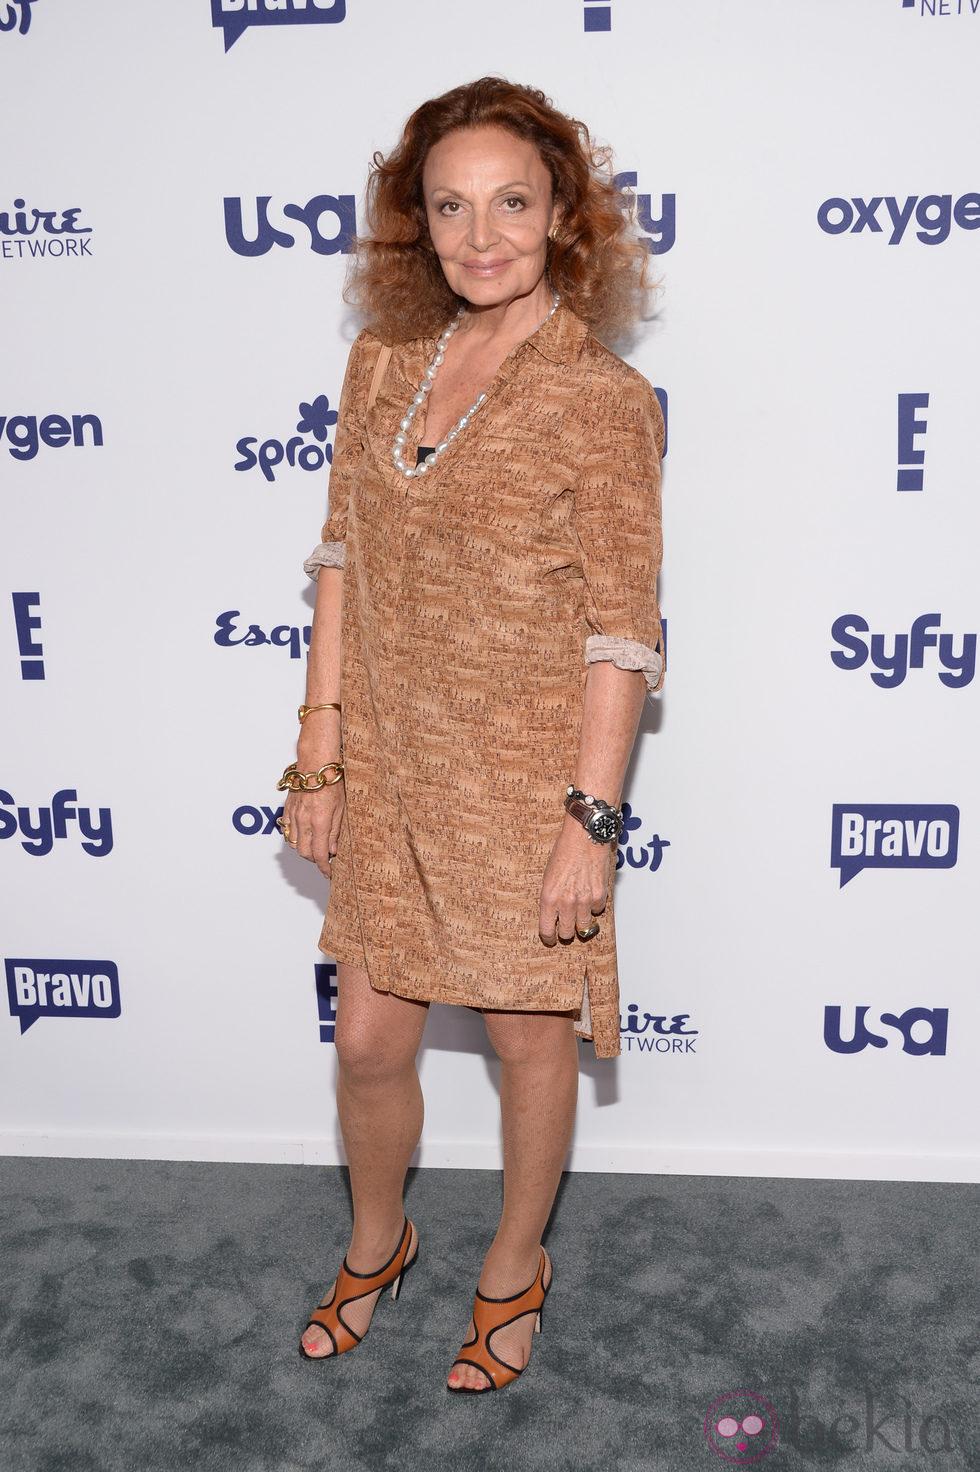 Diane von Fürstenberg en los Upfronts de la NBC Universal 2014